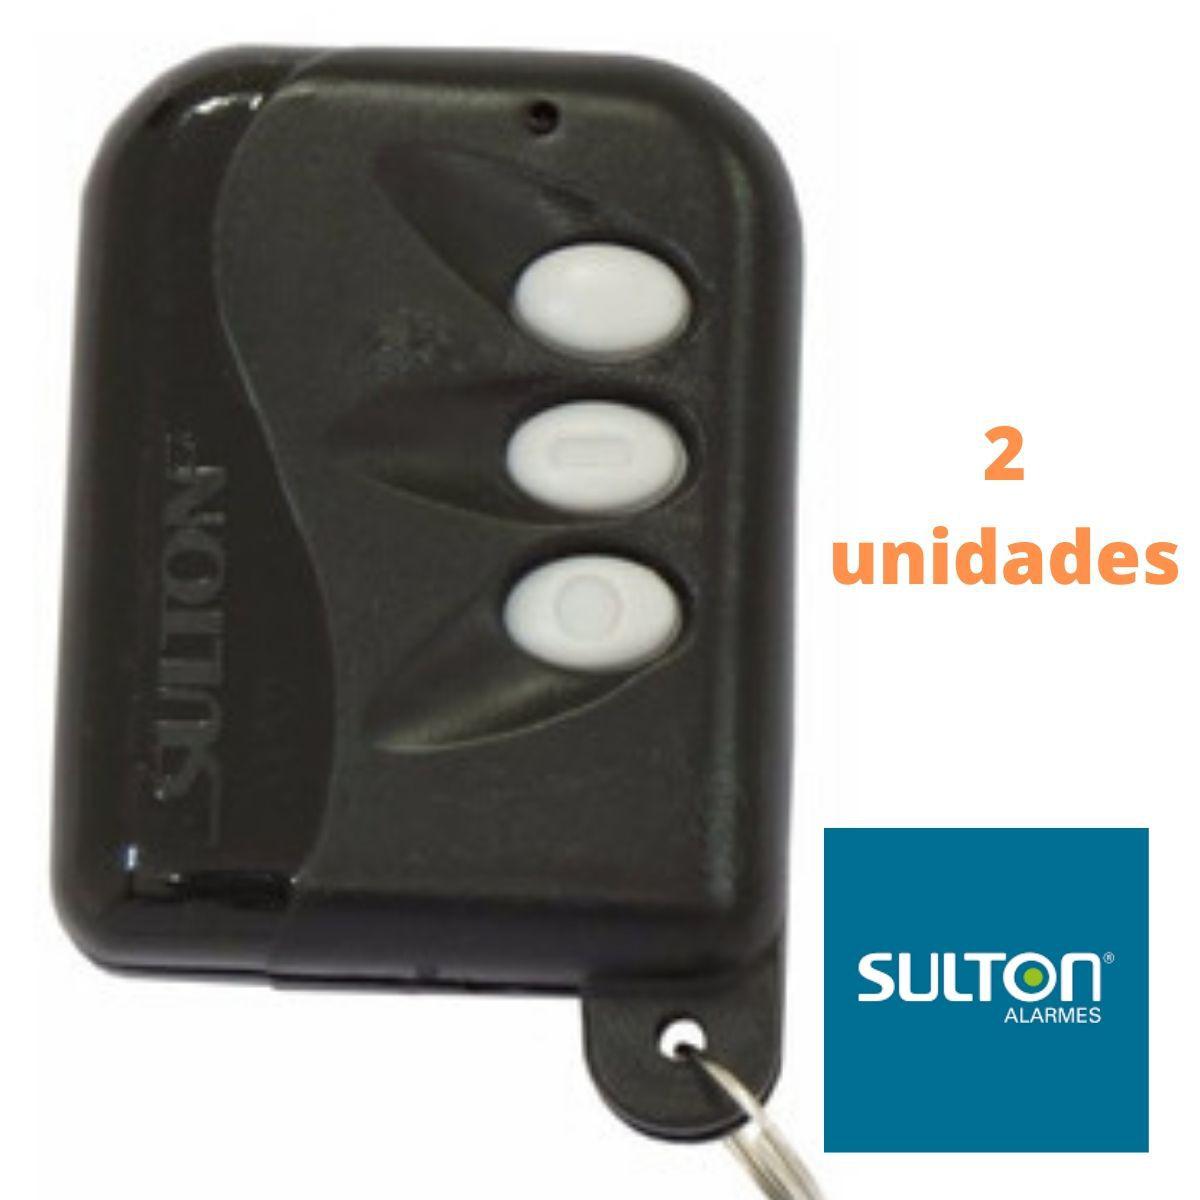 CONTROLE TCL SULTON  2 unidades